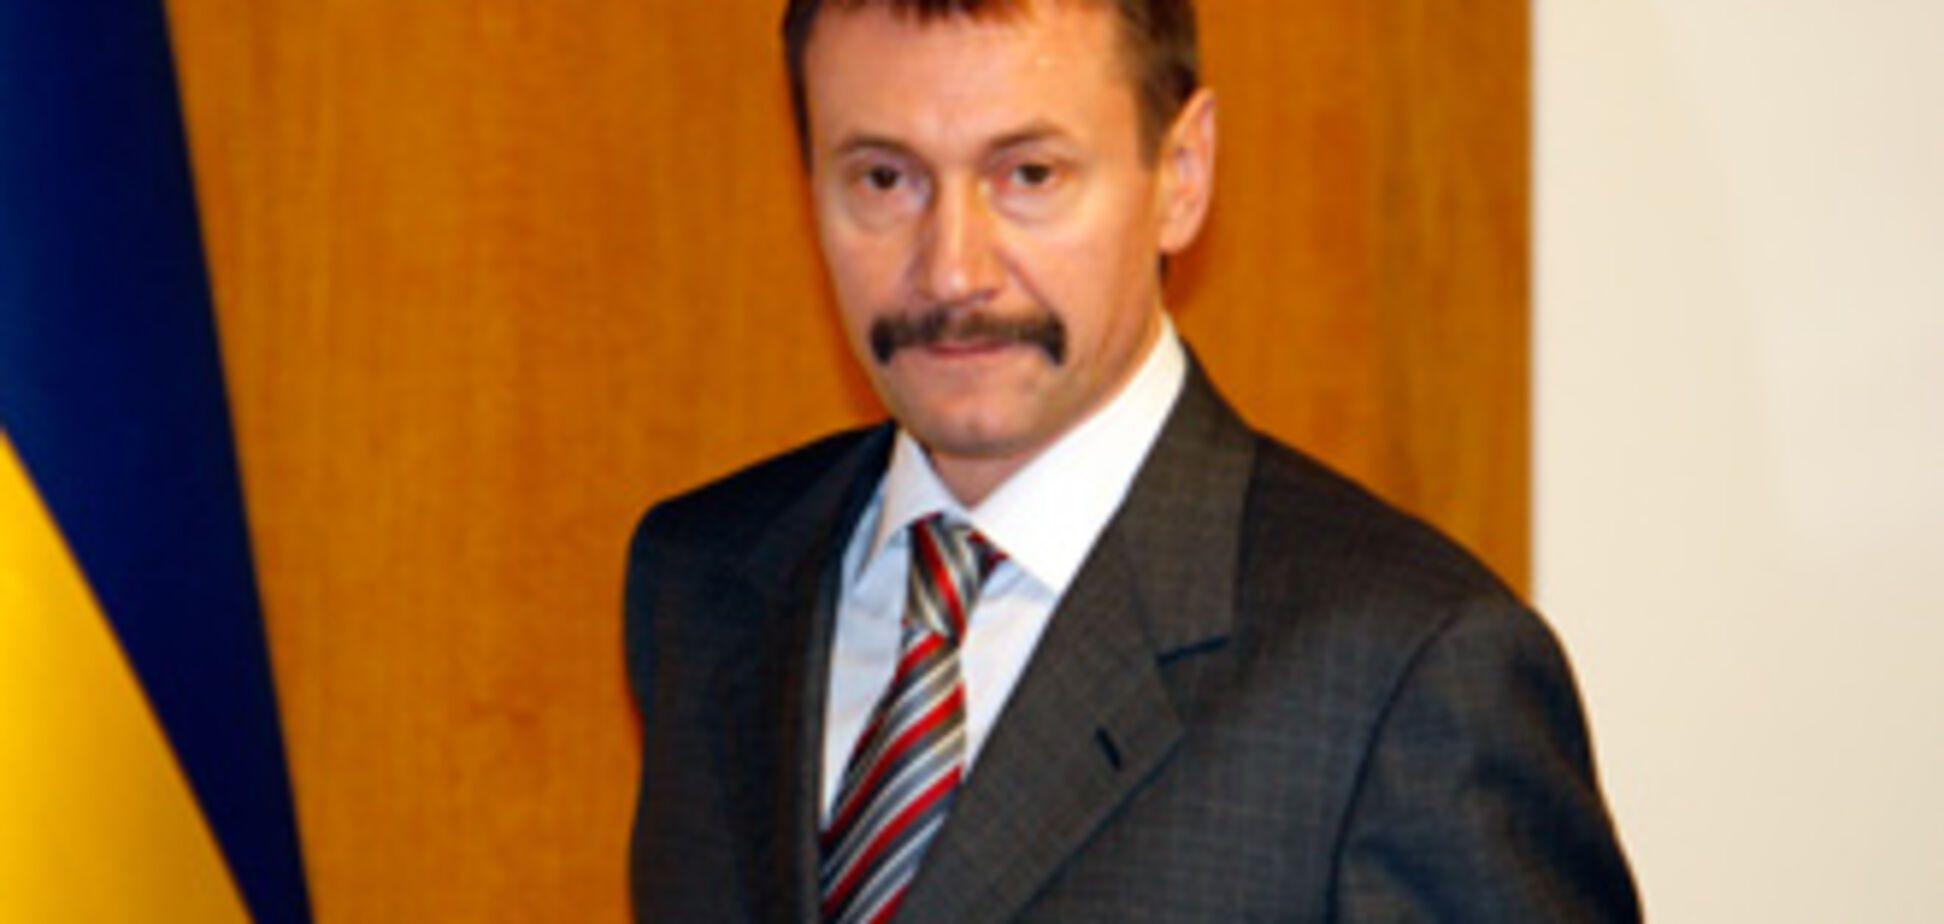 ПР готовит отставку министра соцполитики